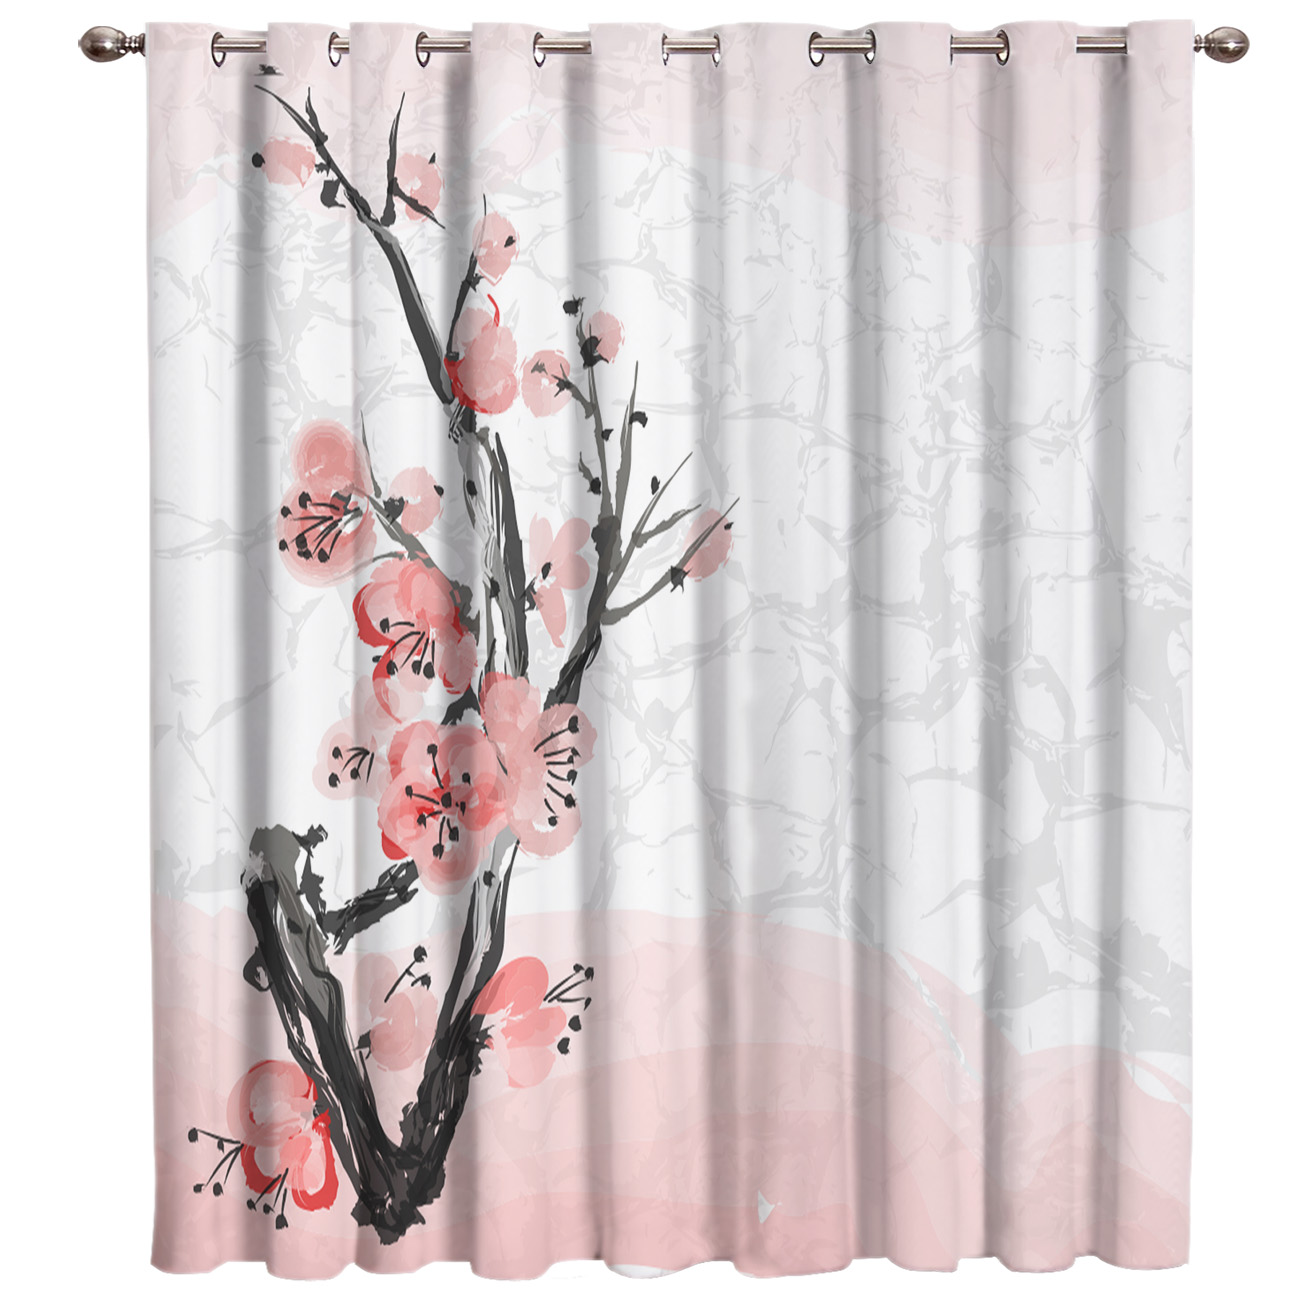 Pink Cherry Blossoms Flower Window Curtains Dark Curtain Lights Bathroom Blackout Outdoor Bedroom Indoor Decor Kids Curtain